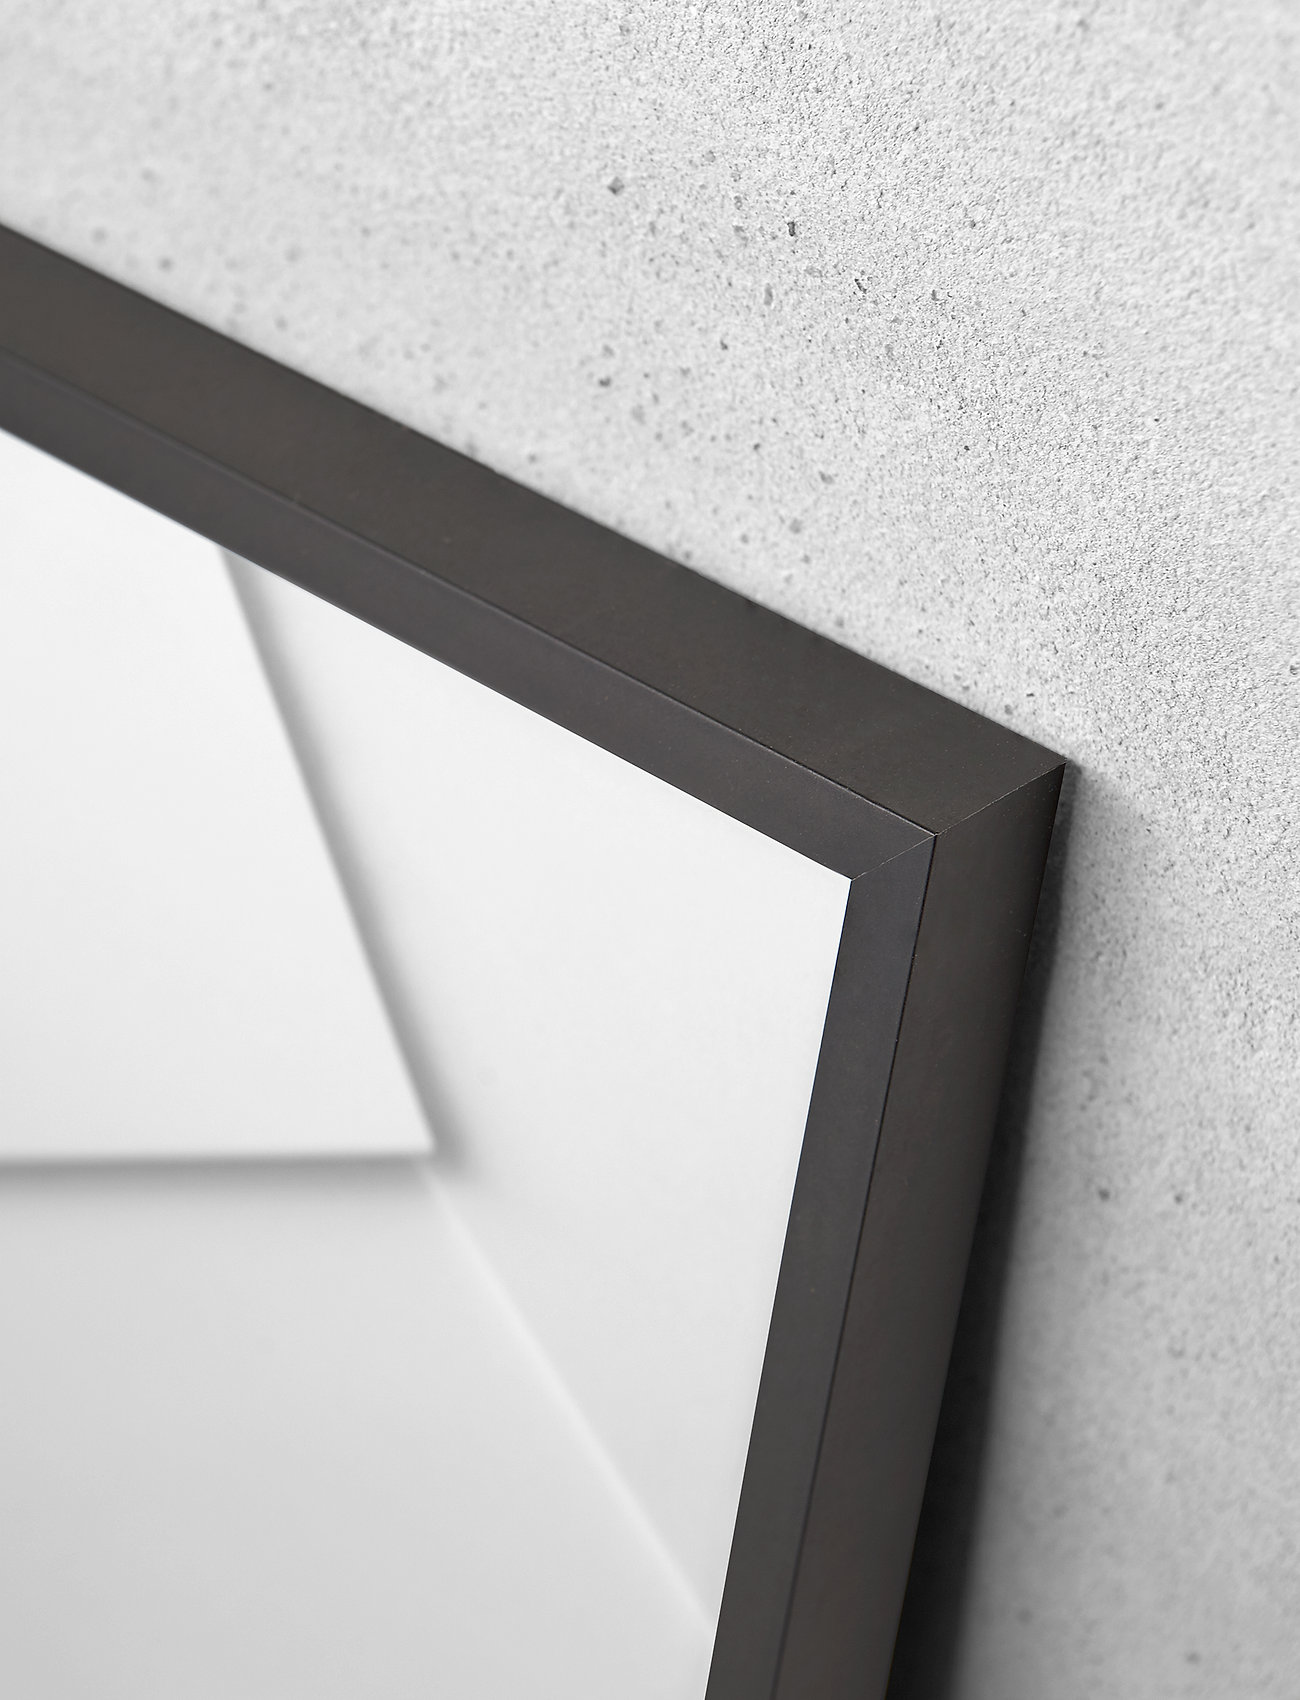 ChiCura - Alu Frame 30x40cm - Acrylic - billedrammer - black - 1